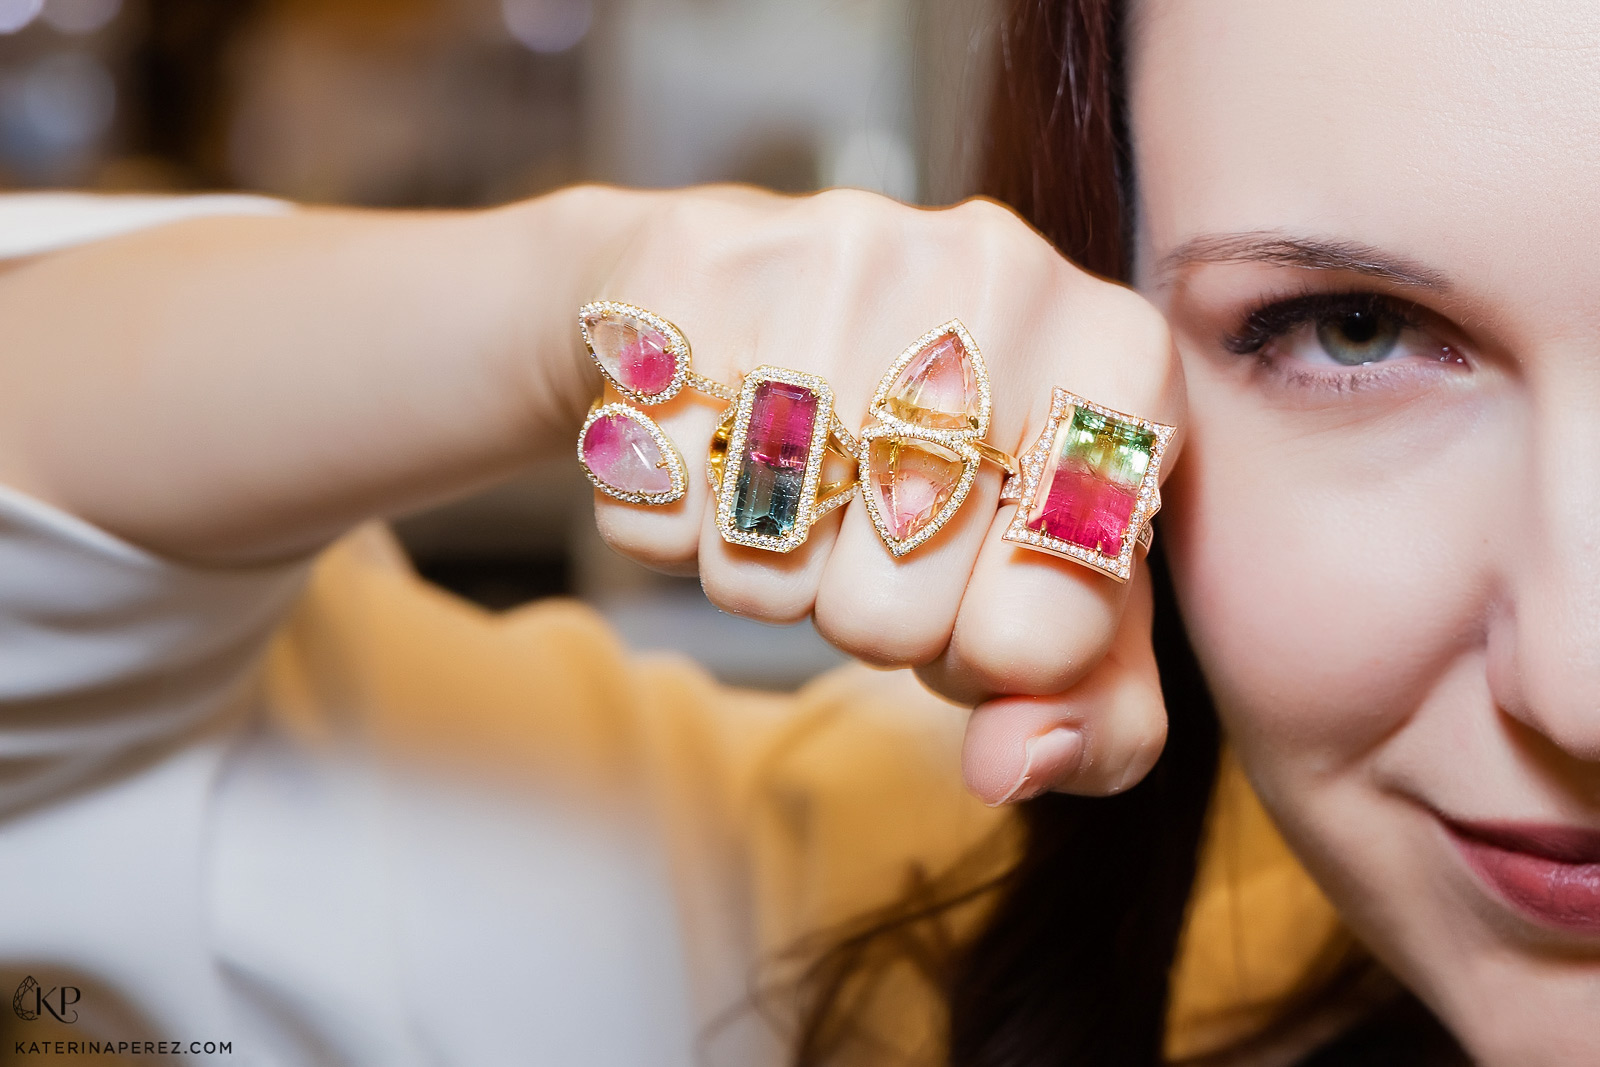 Katerina Perez shows off some toumaline rings